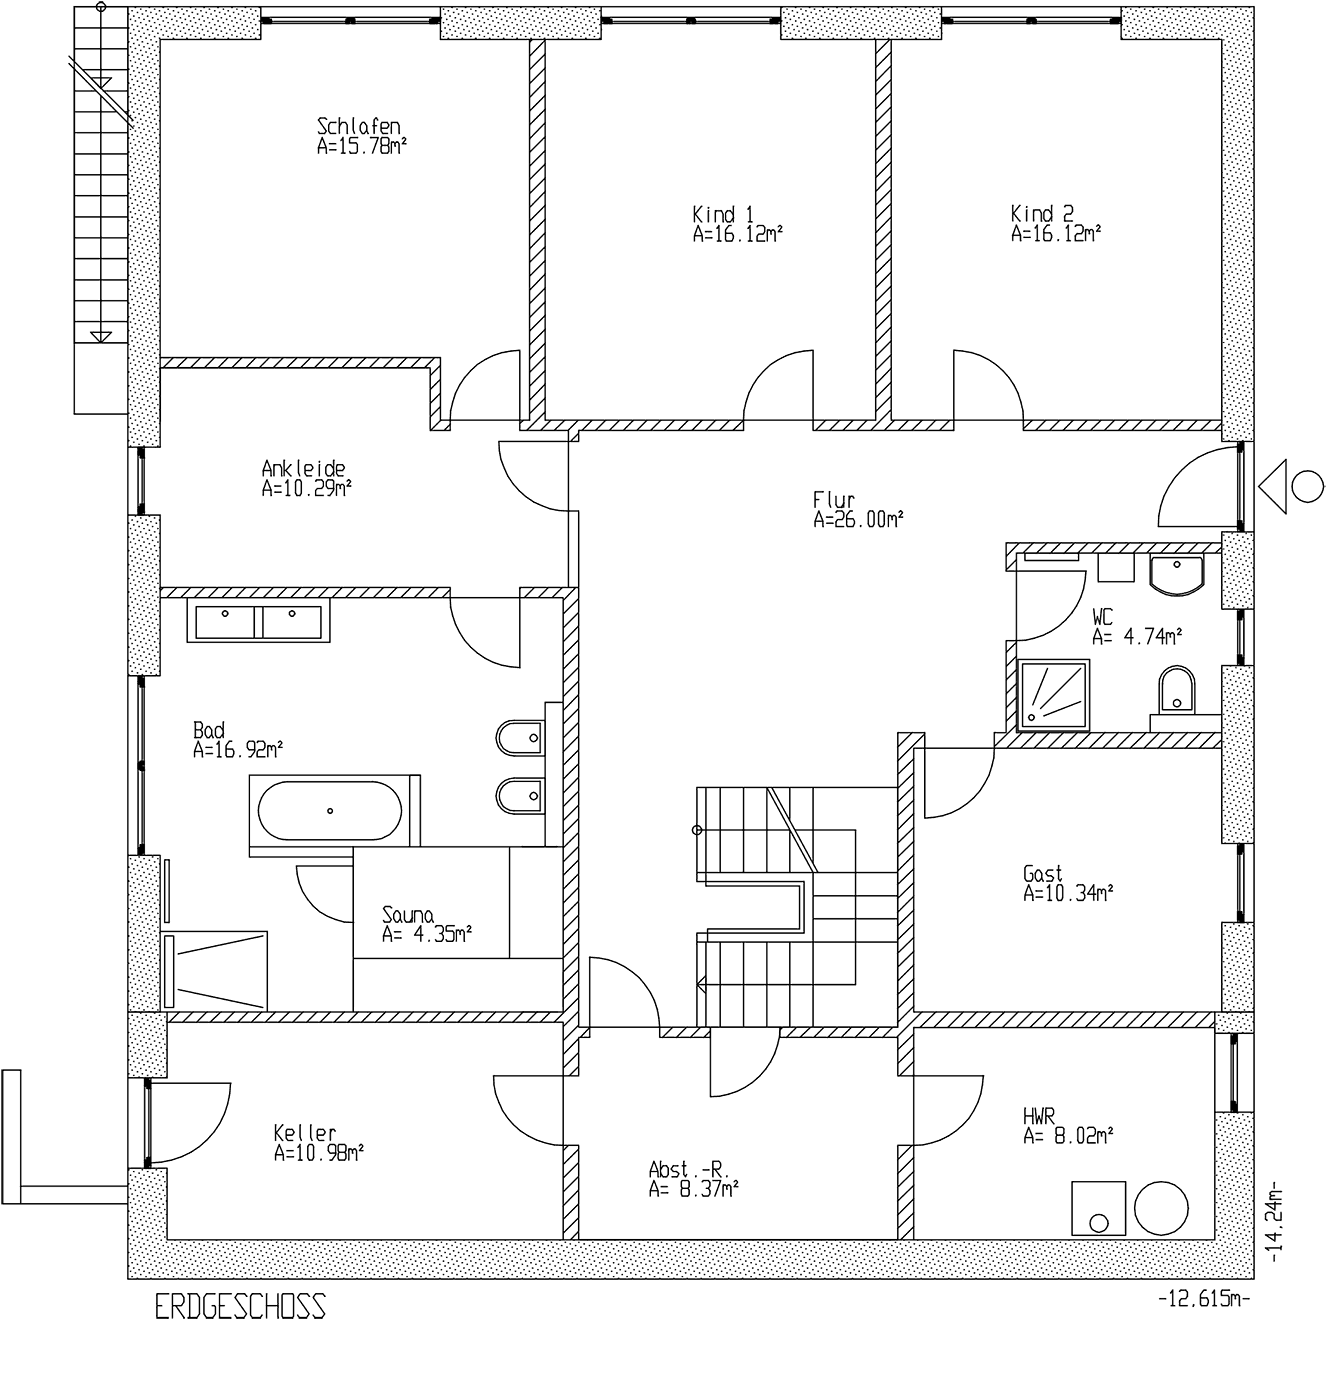 bauhaus-in-hanglage-grundriss-eg